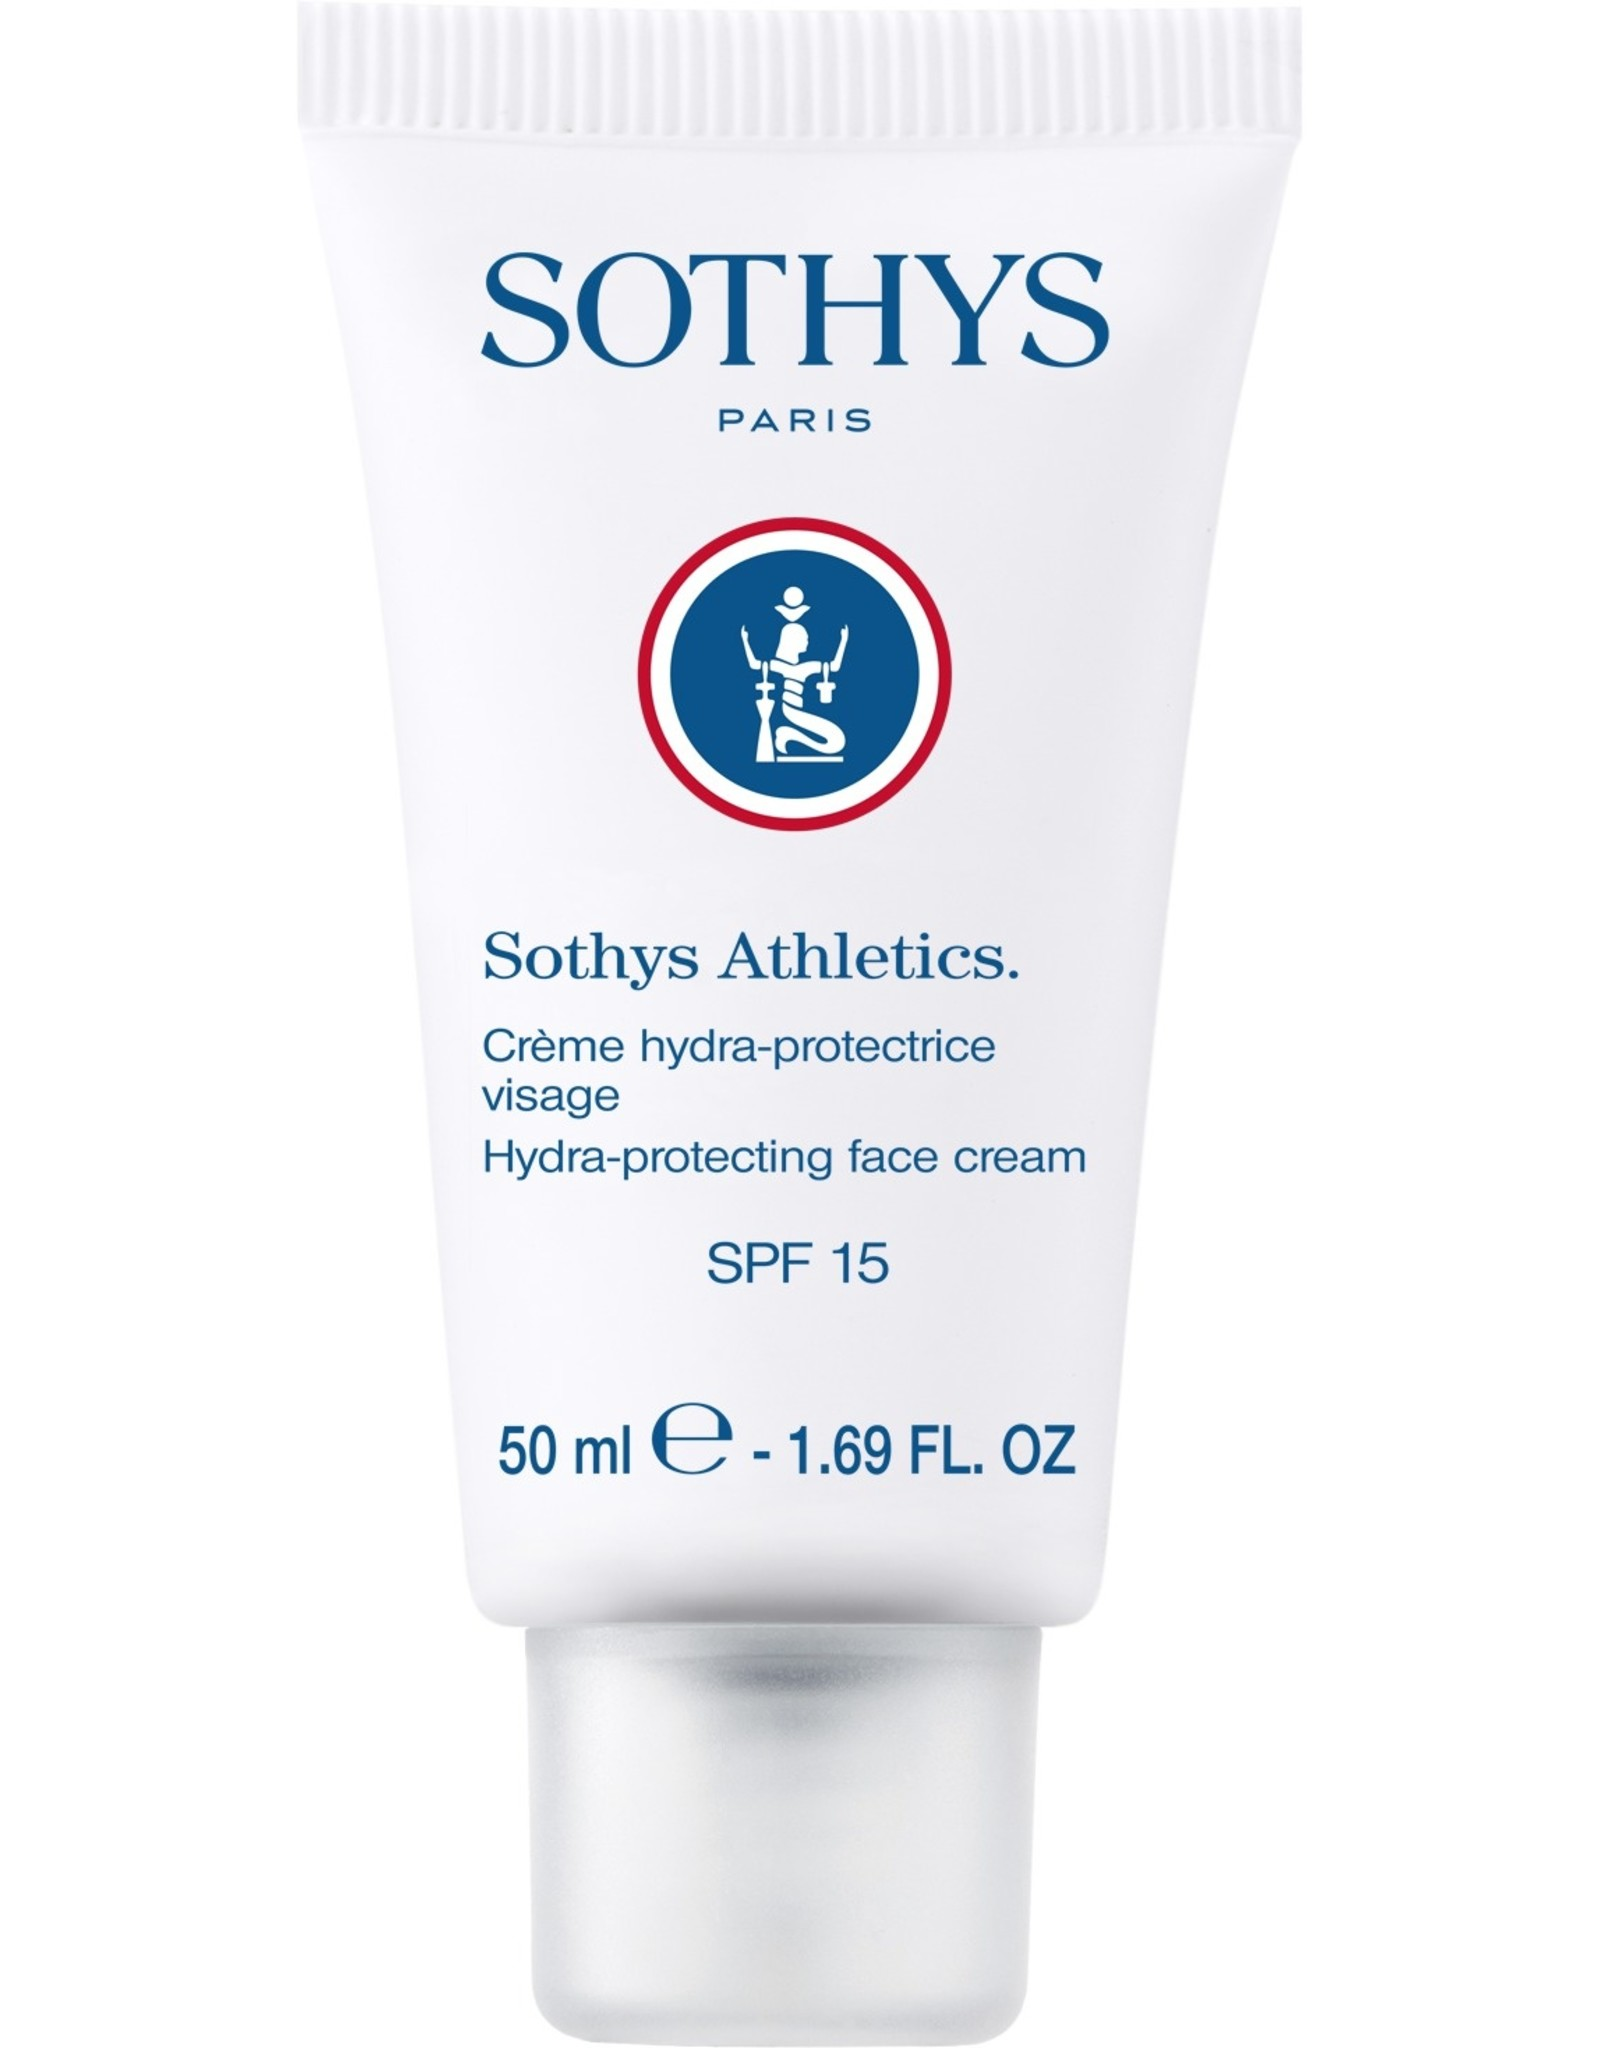 SOTHYS Crème hydra-protectrice visage, teintée SPF15 - Sothys